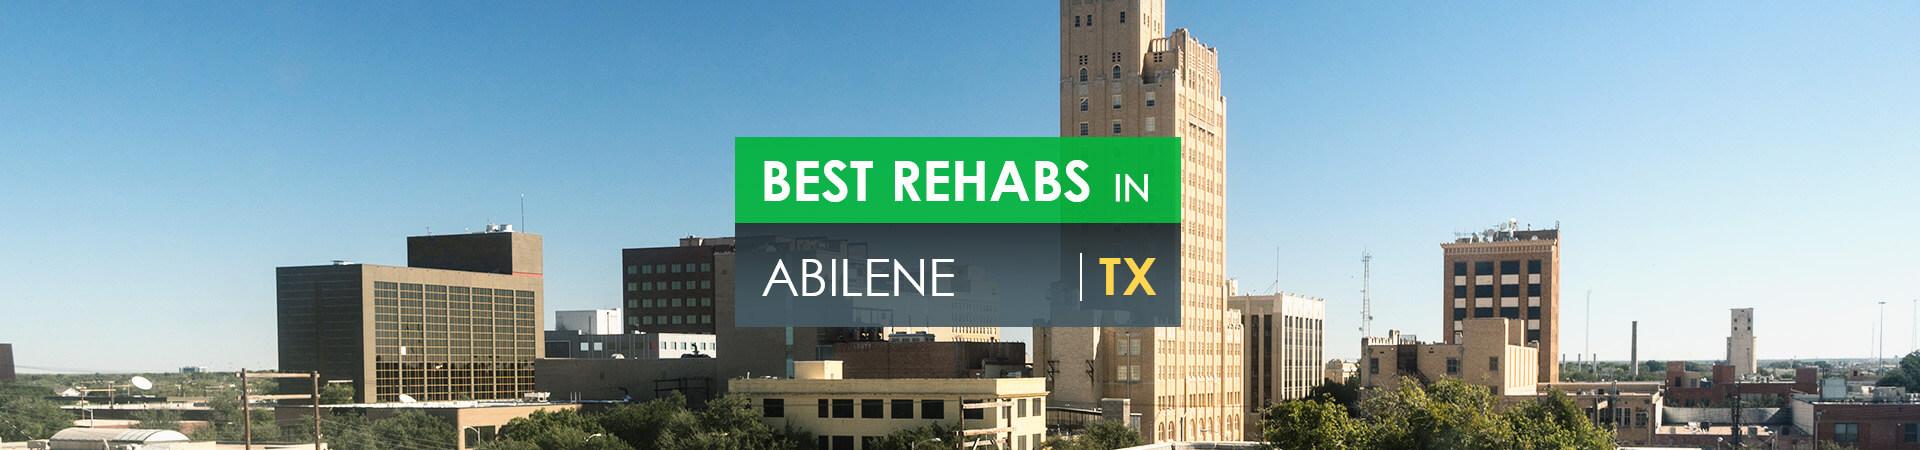 Best rehabs in Abilene, TX